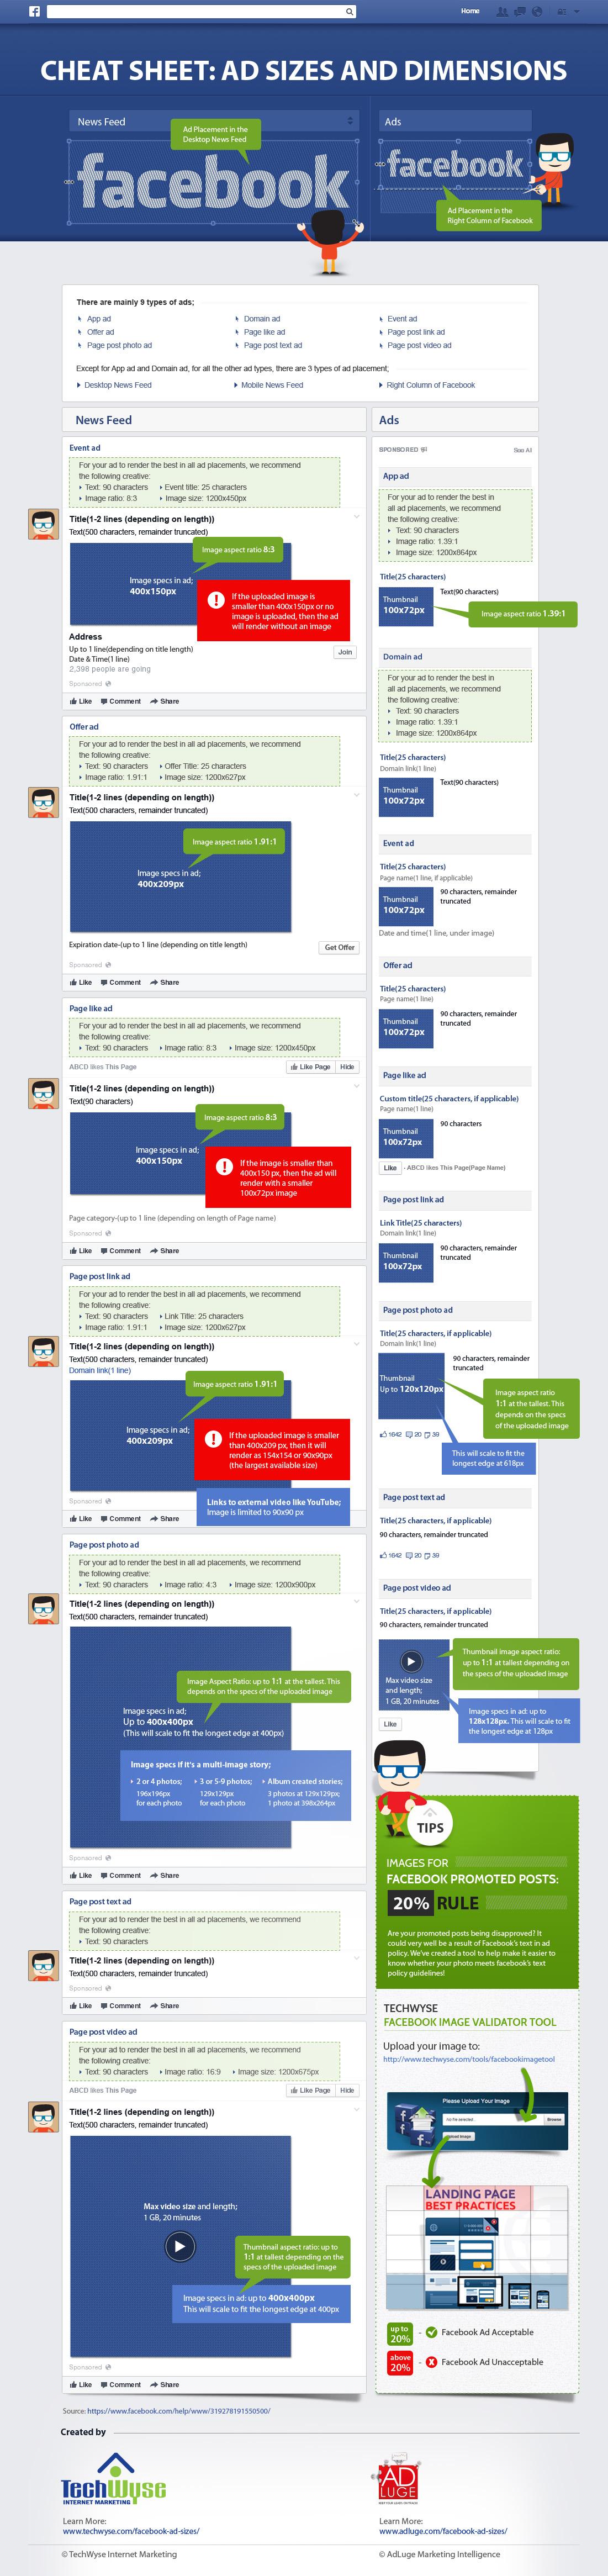 Cheat Sheet: Ad sizes and dimensions - #SocialMedia